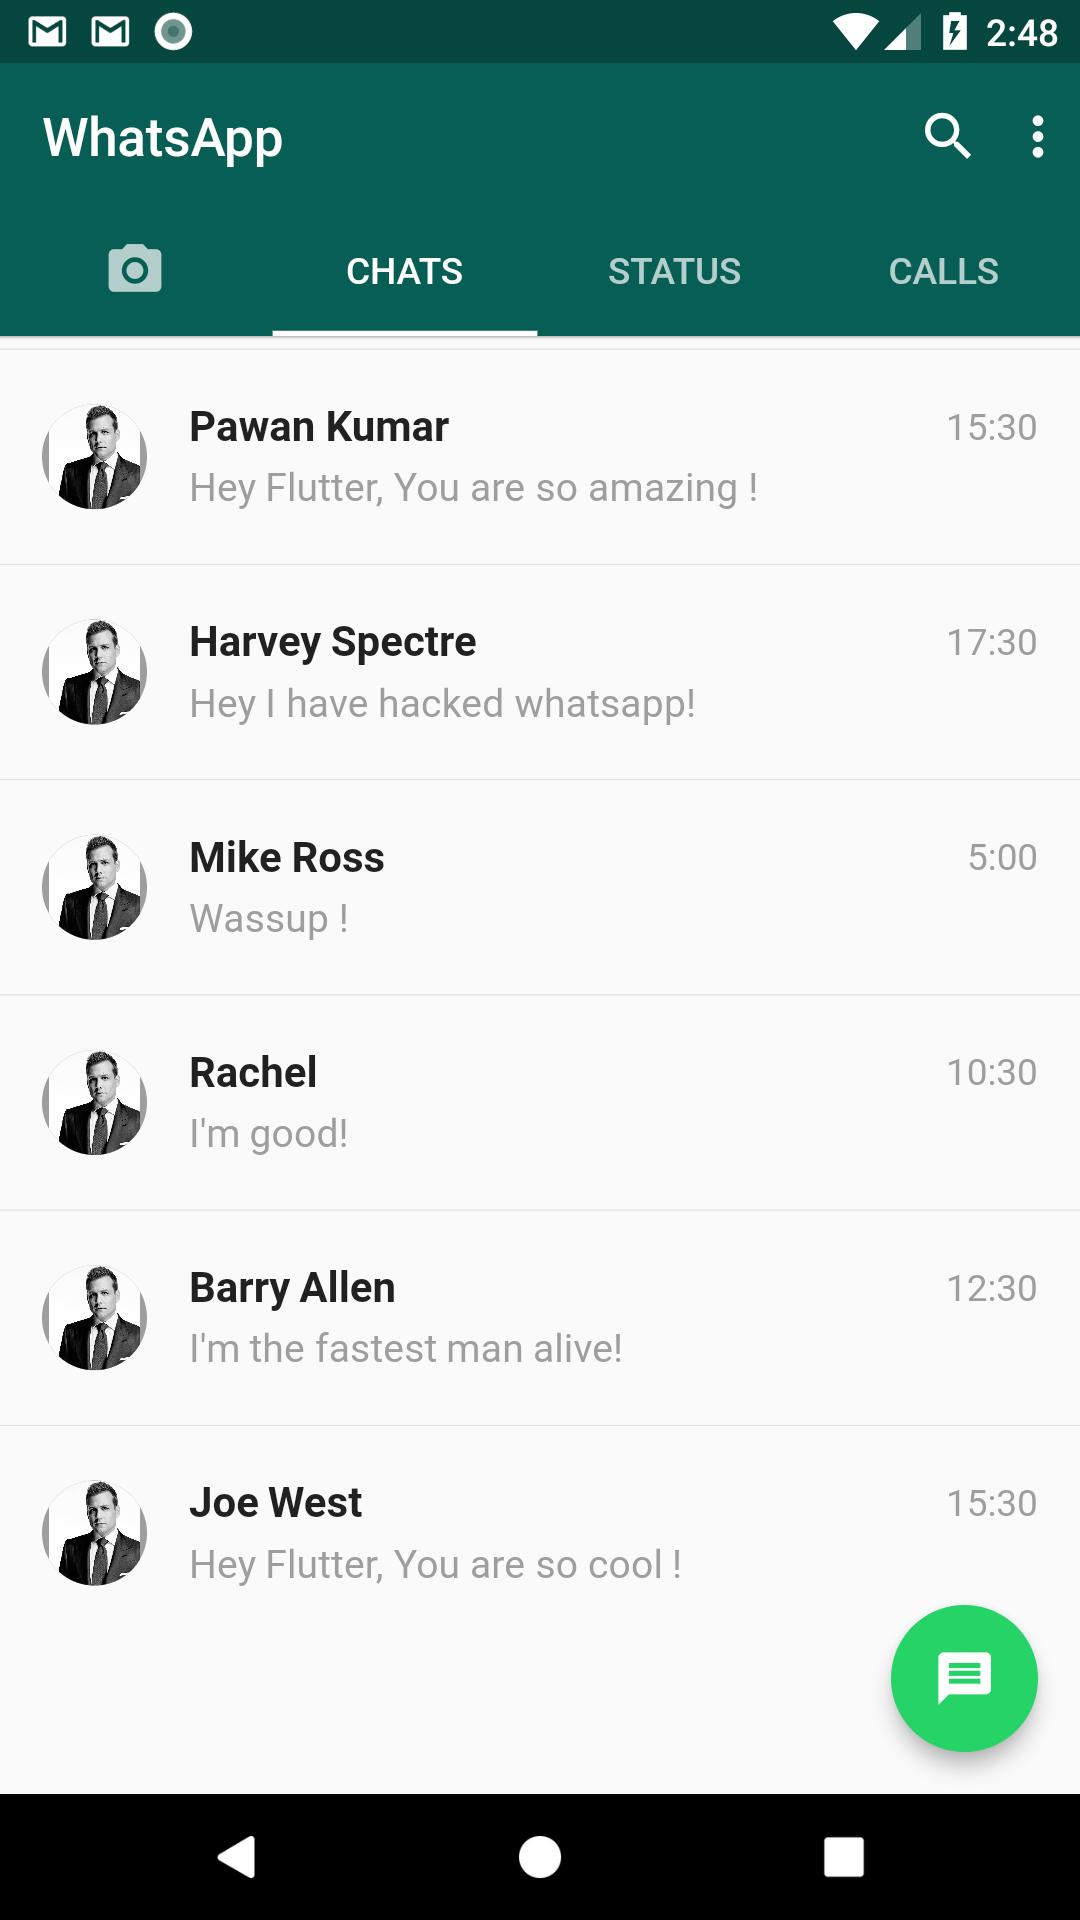 Building a WhatsApp Clone in Flutter.